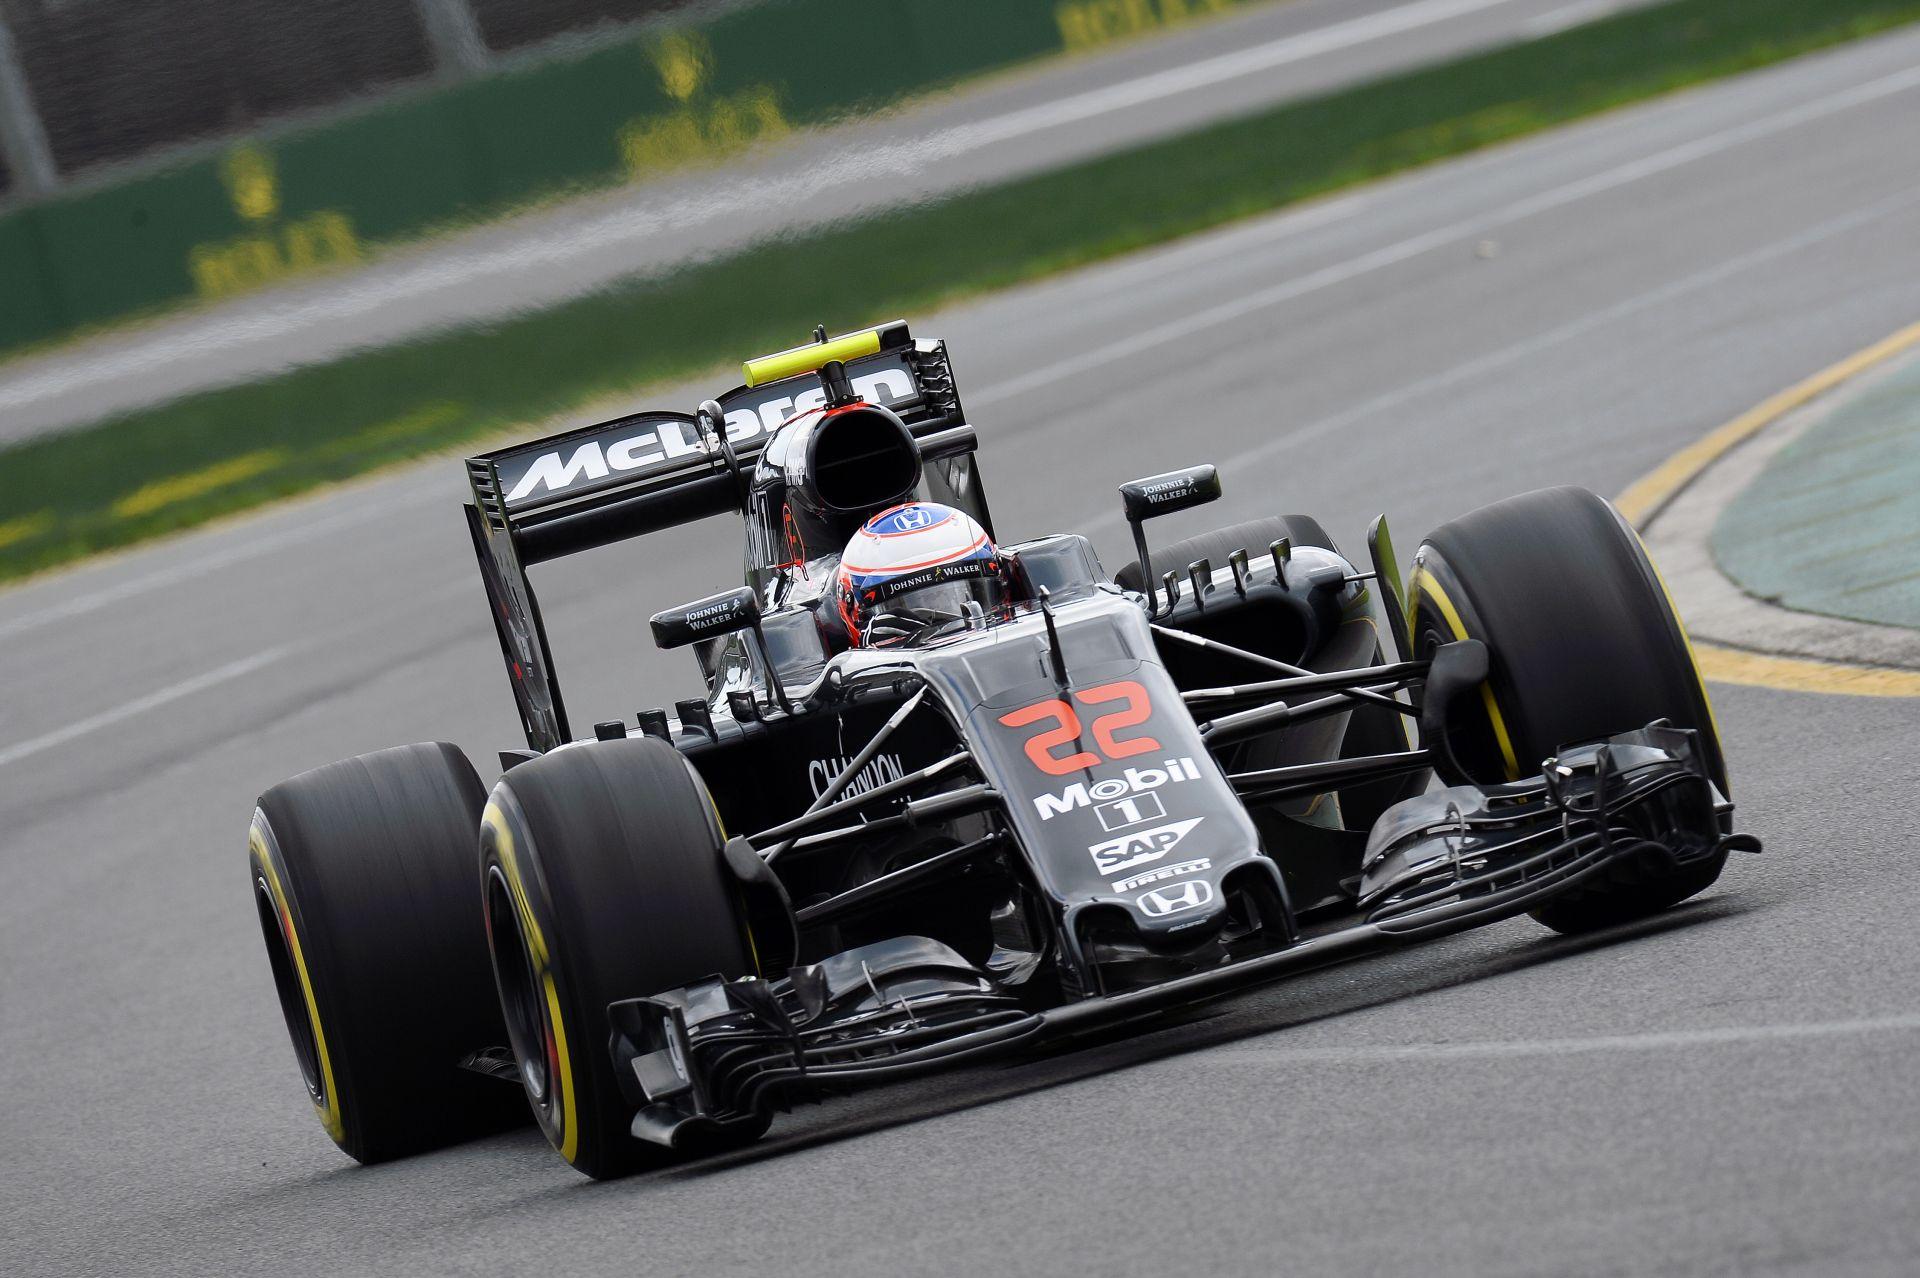 Button nagyon boldog, hogy Alonso jól van